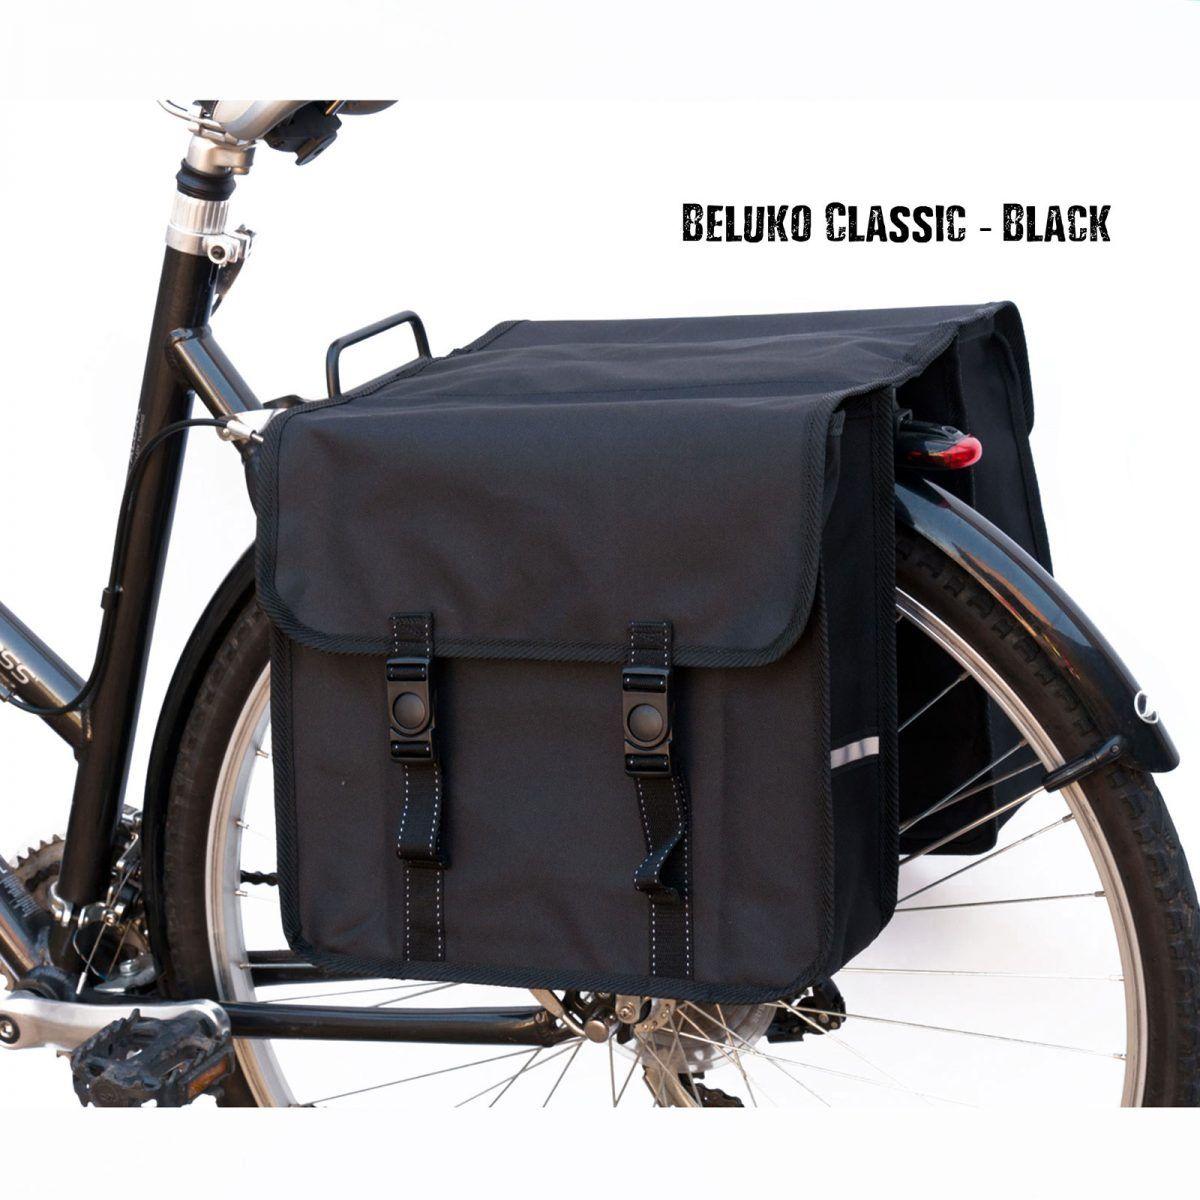 Bicycle Bike Plastic Water Resistant Double Storage Travel Pannier Bag